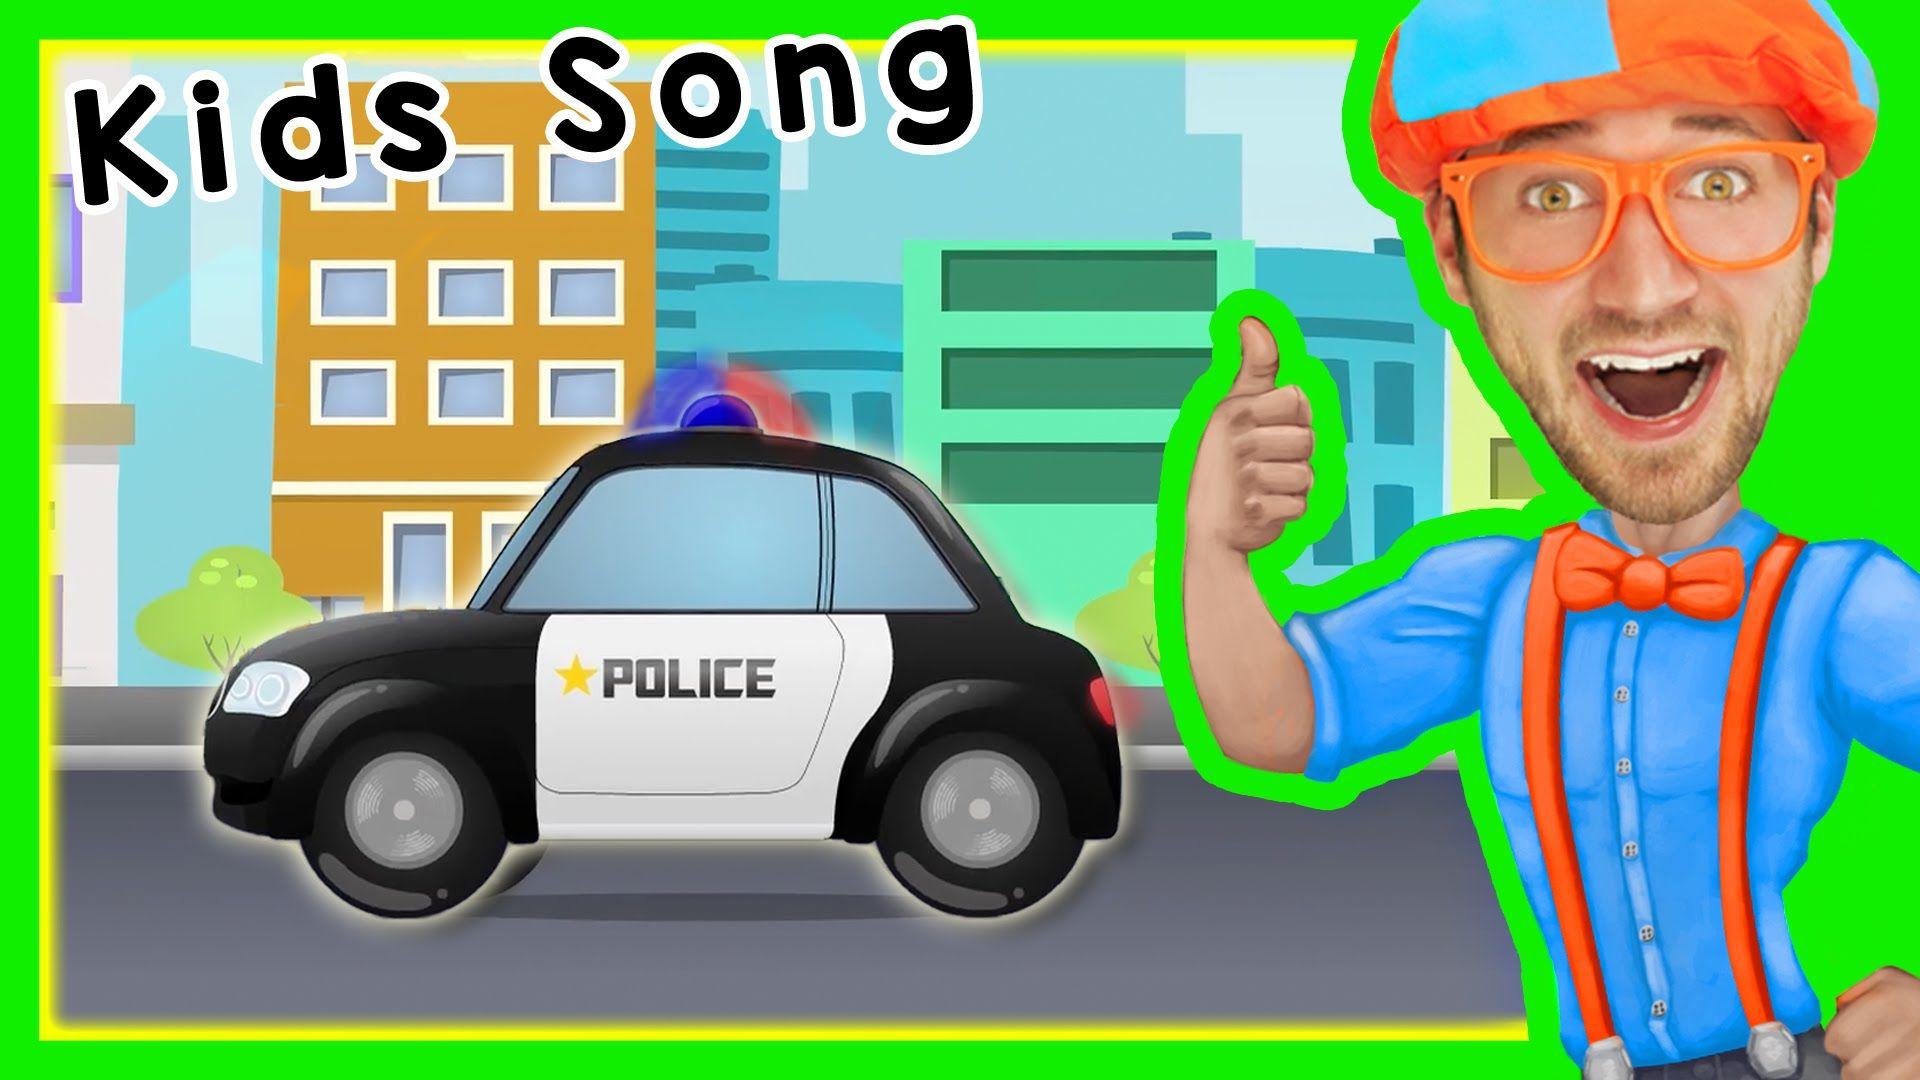 Police Cars for Children with Blippi | Songs for Kids